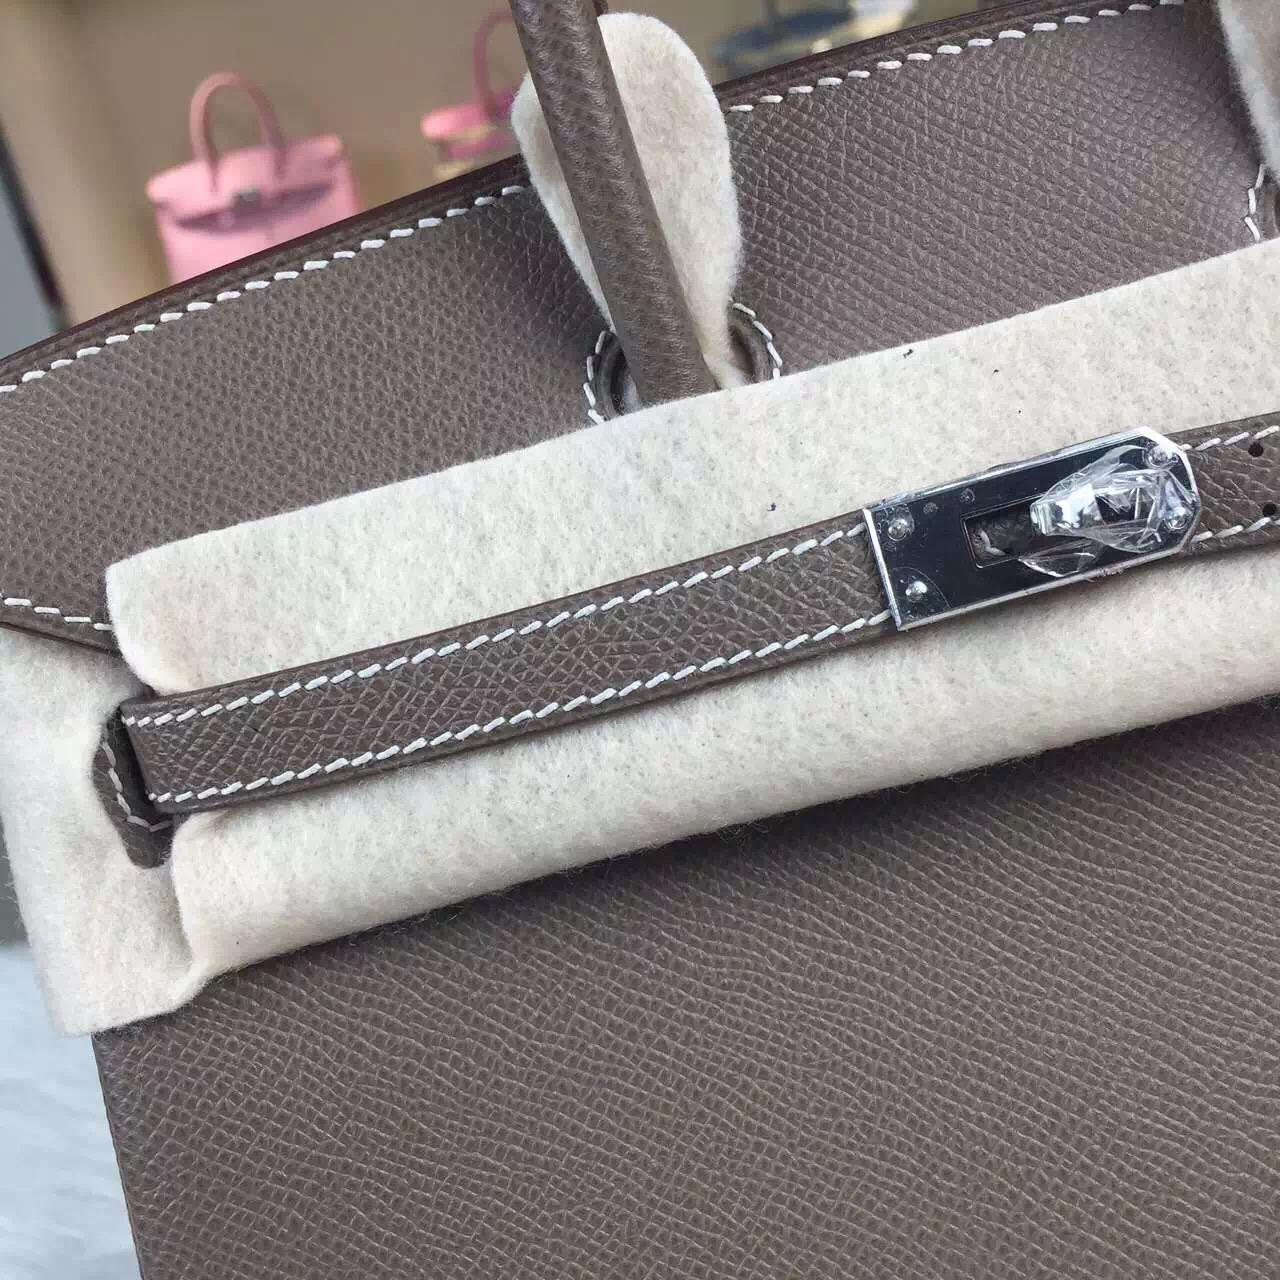 Discount Hermes C81 Etoupe Grey Epsom Calfskin Leather Birkin Bag25cm Silver Hardware